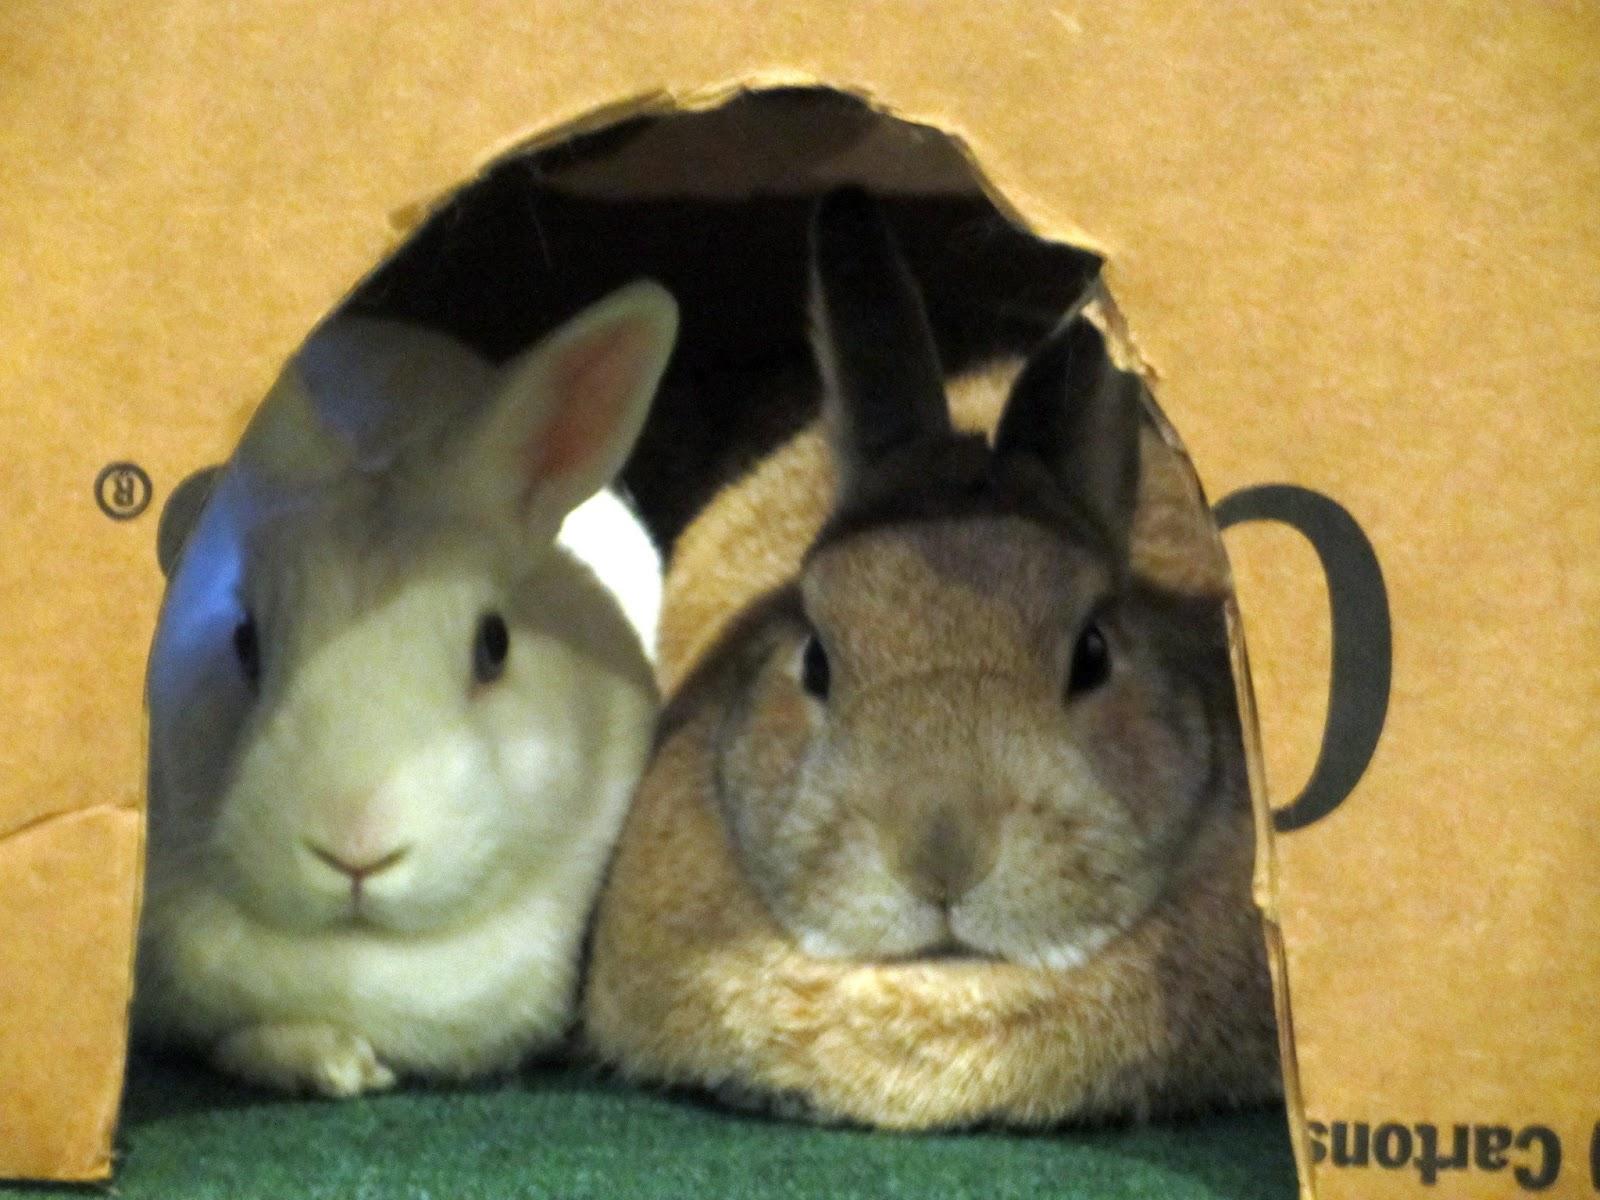 First spotted this cute couple in their favorite Cheerios box. 5d17e7da4